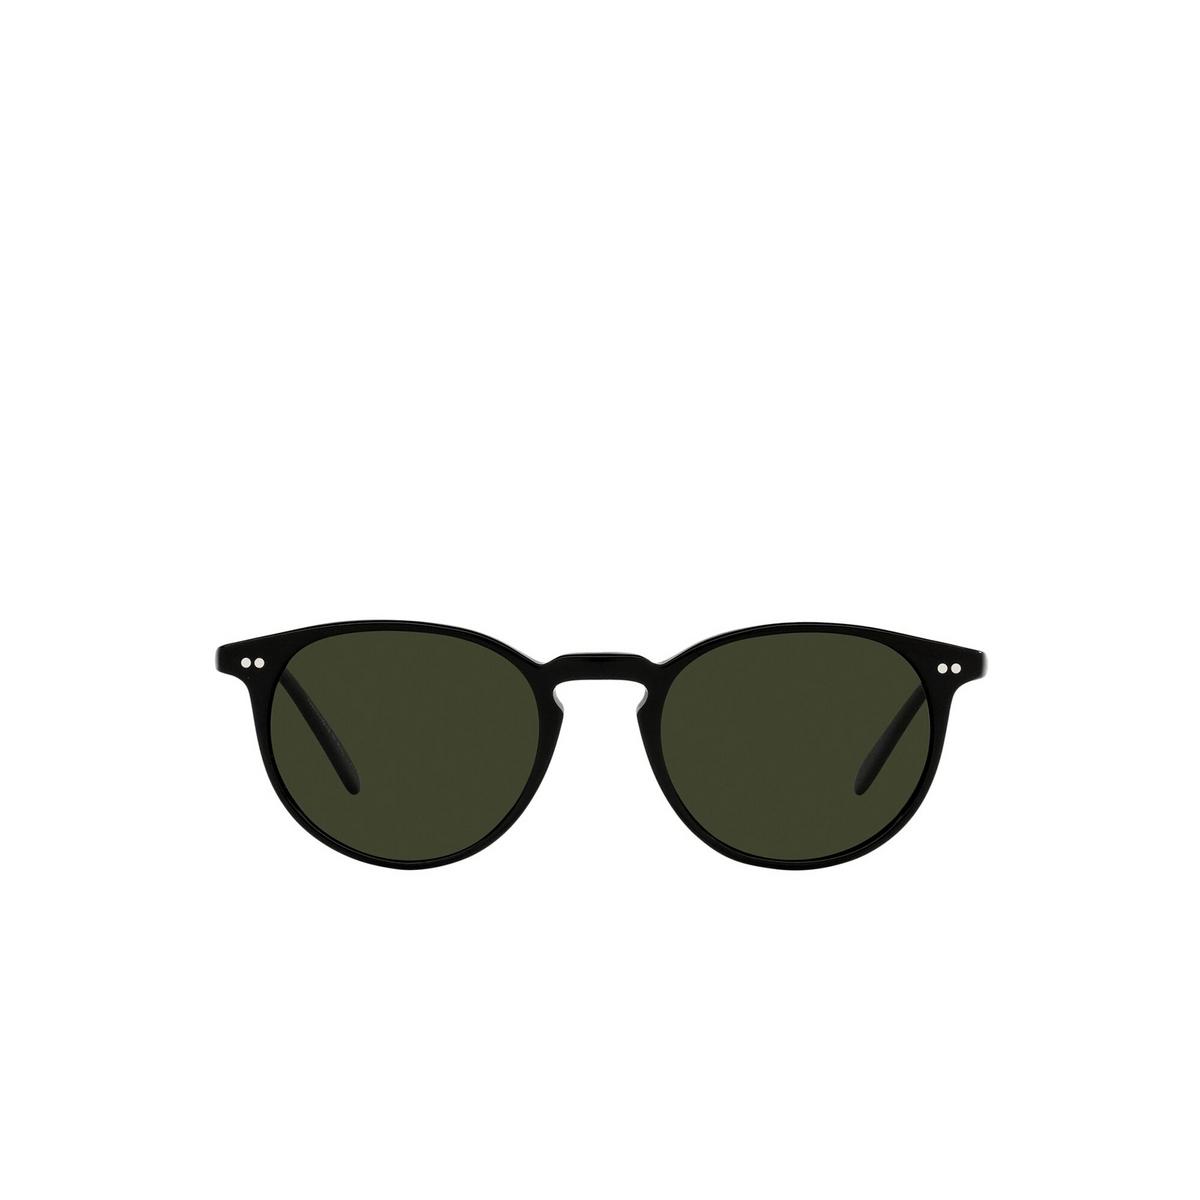 Oliver Peoples® Round Sunglasses: Riley Sun OV5004SU color Black 1005P1 - front view.